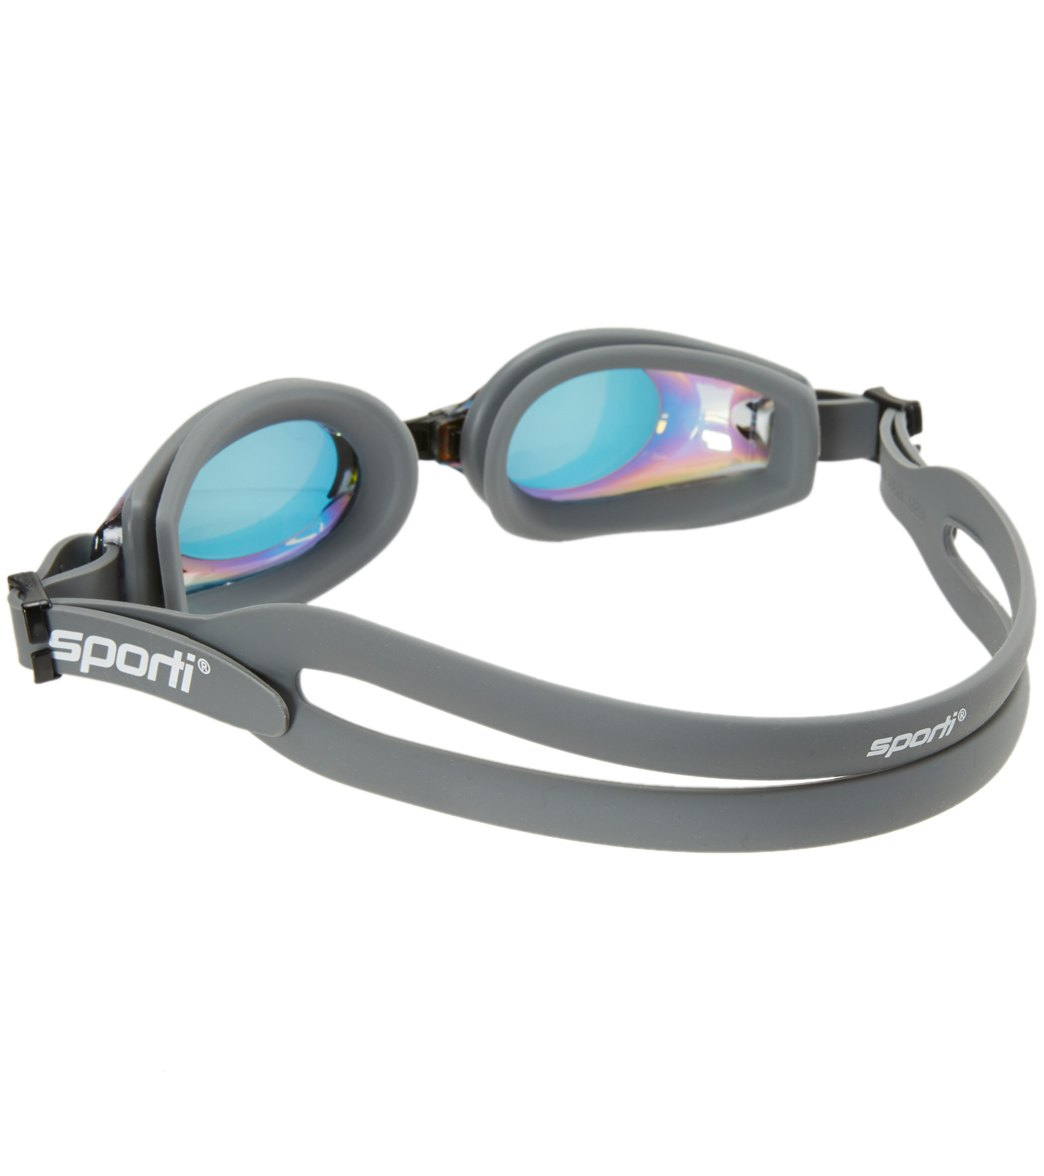 01f9c13d65 Sporti Antifog Optical Pro II Mirrored Goggle at SwimOutlet.com